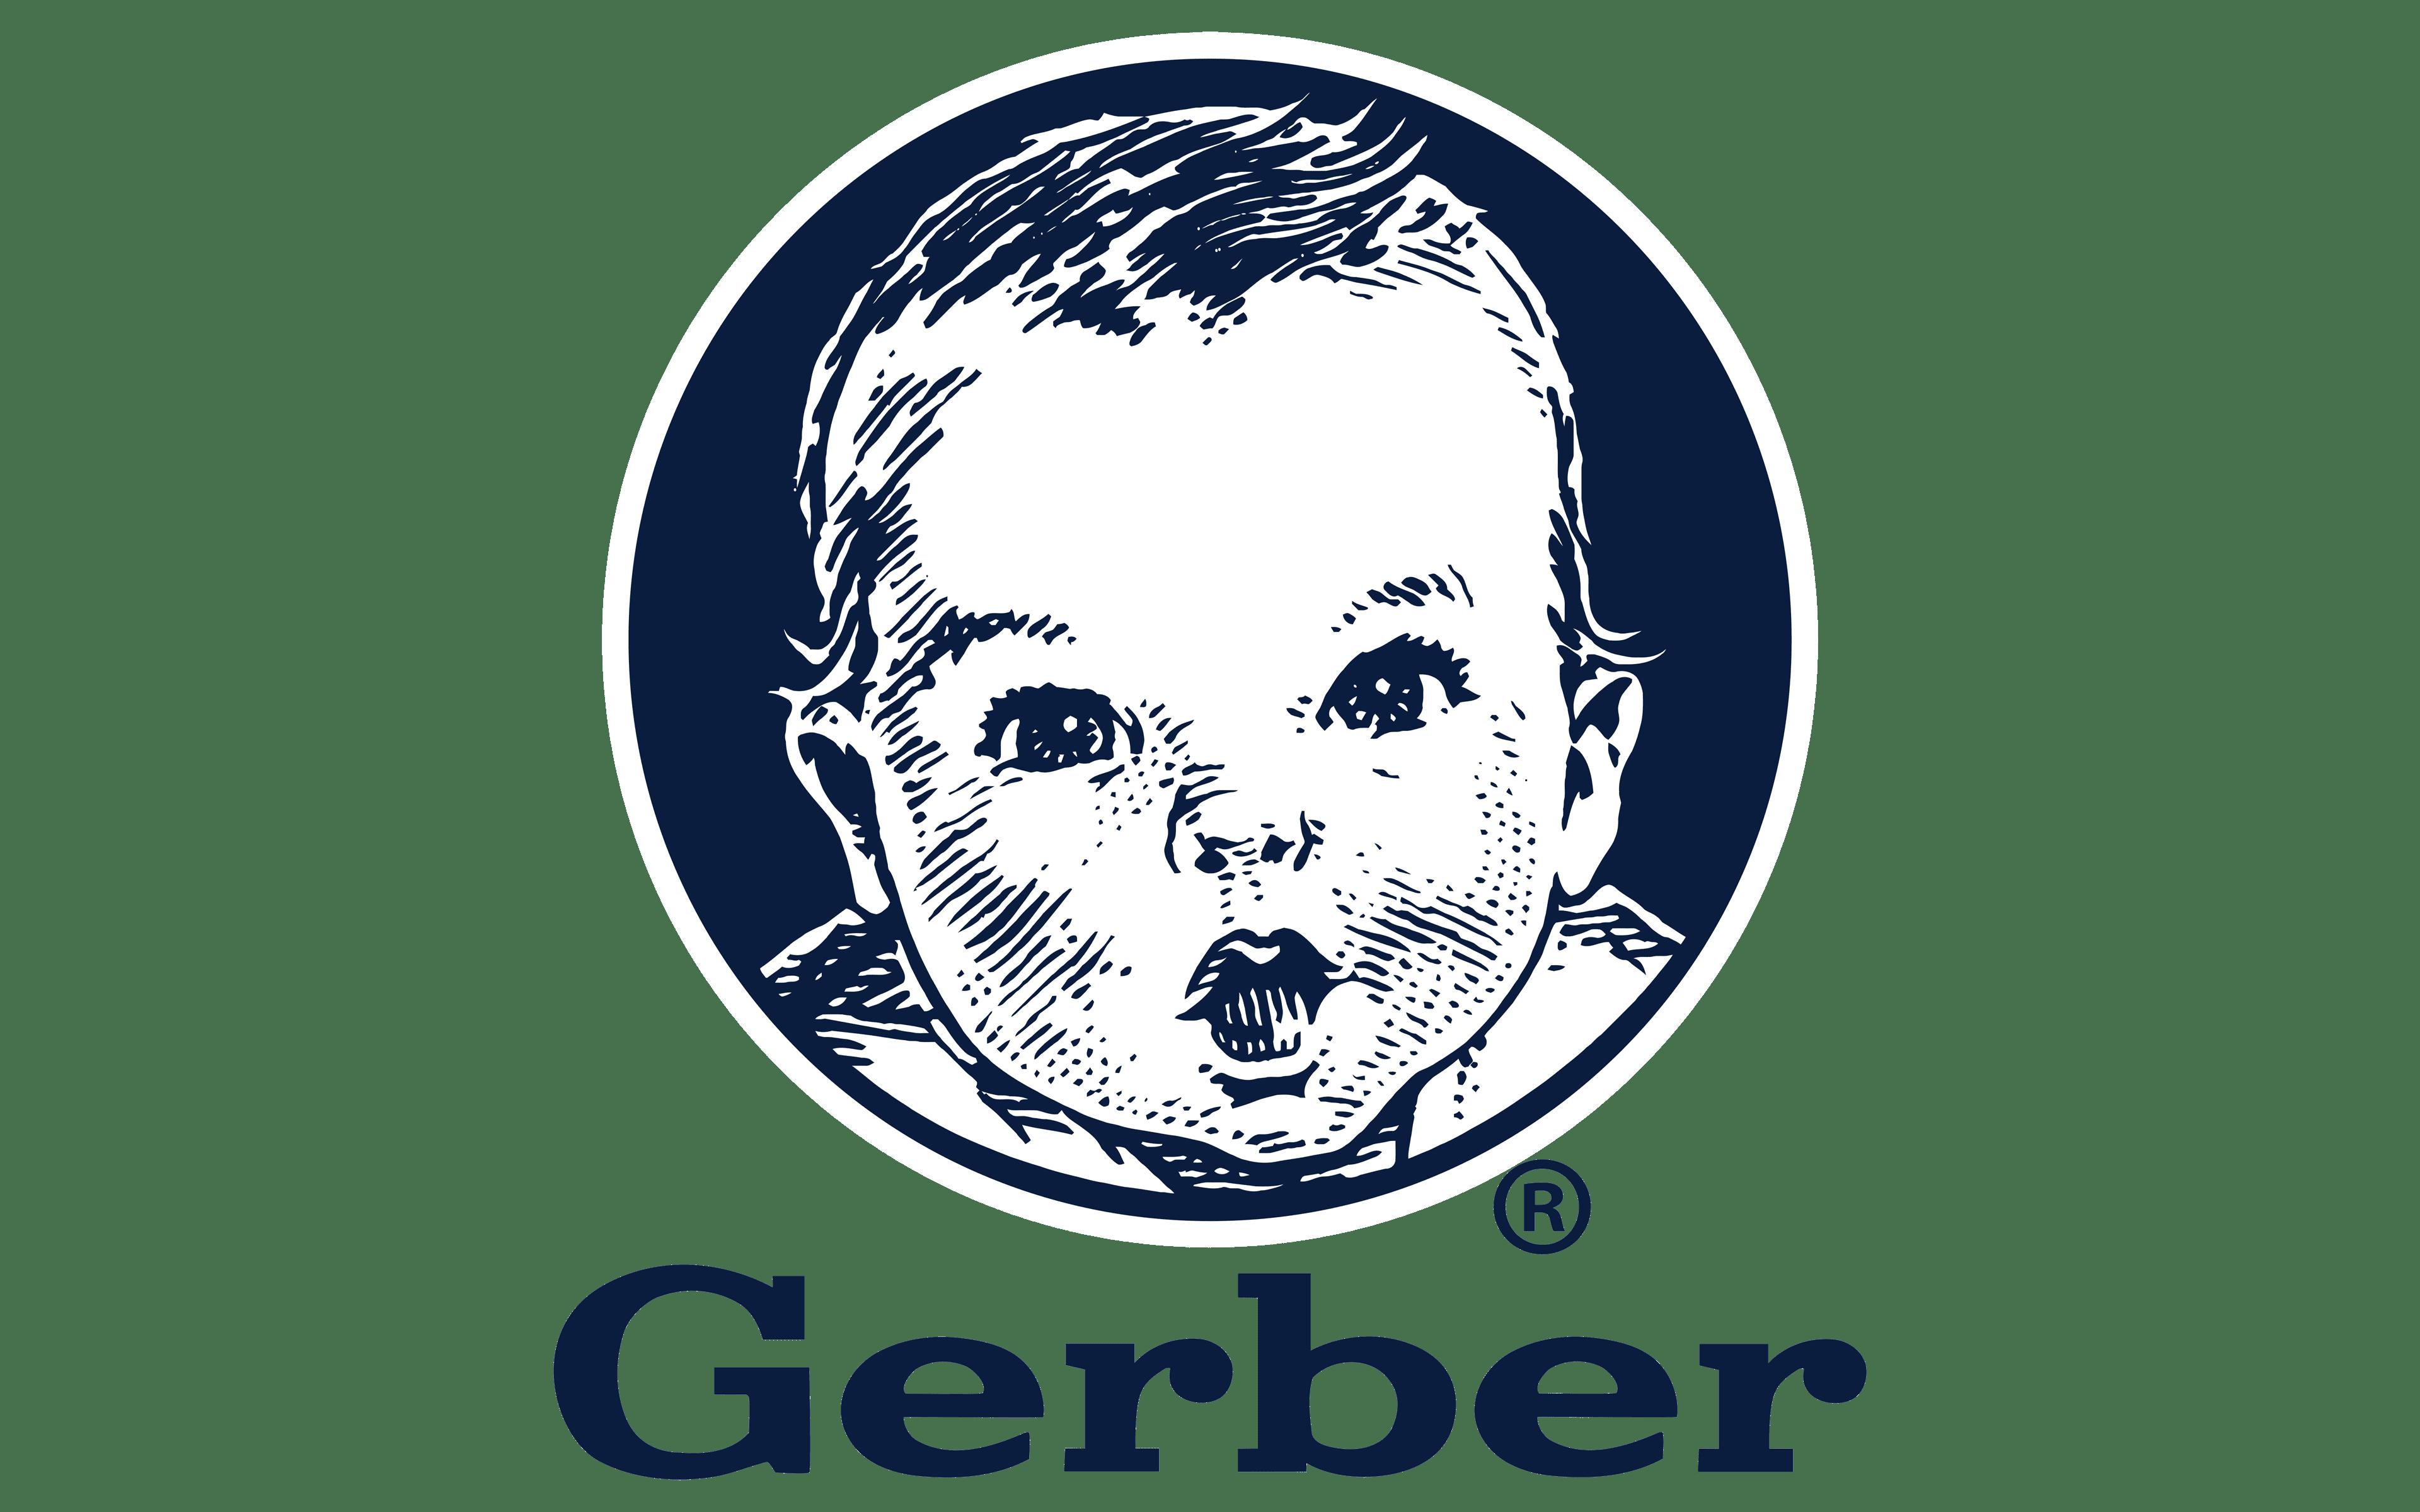 جربر - Gerber